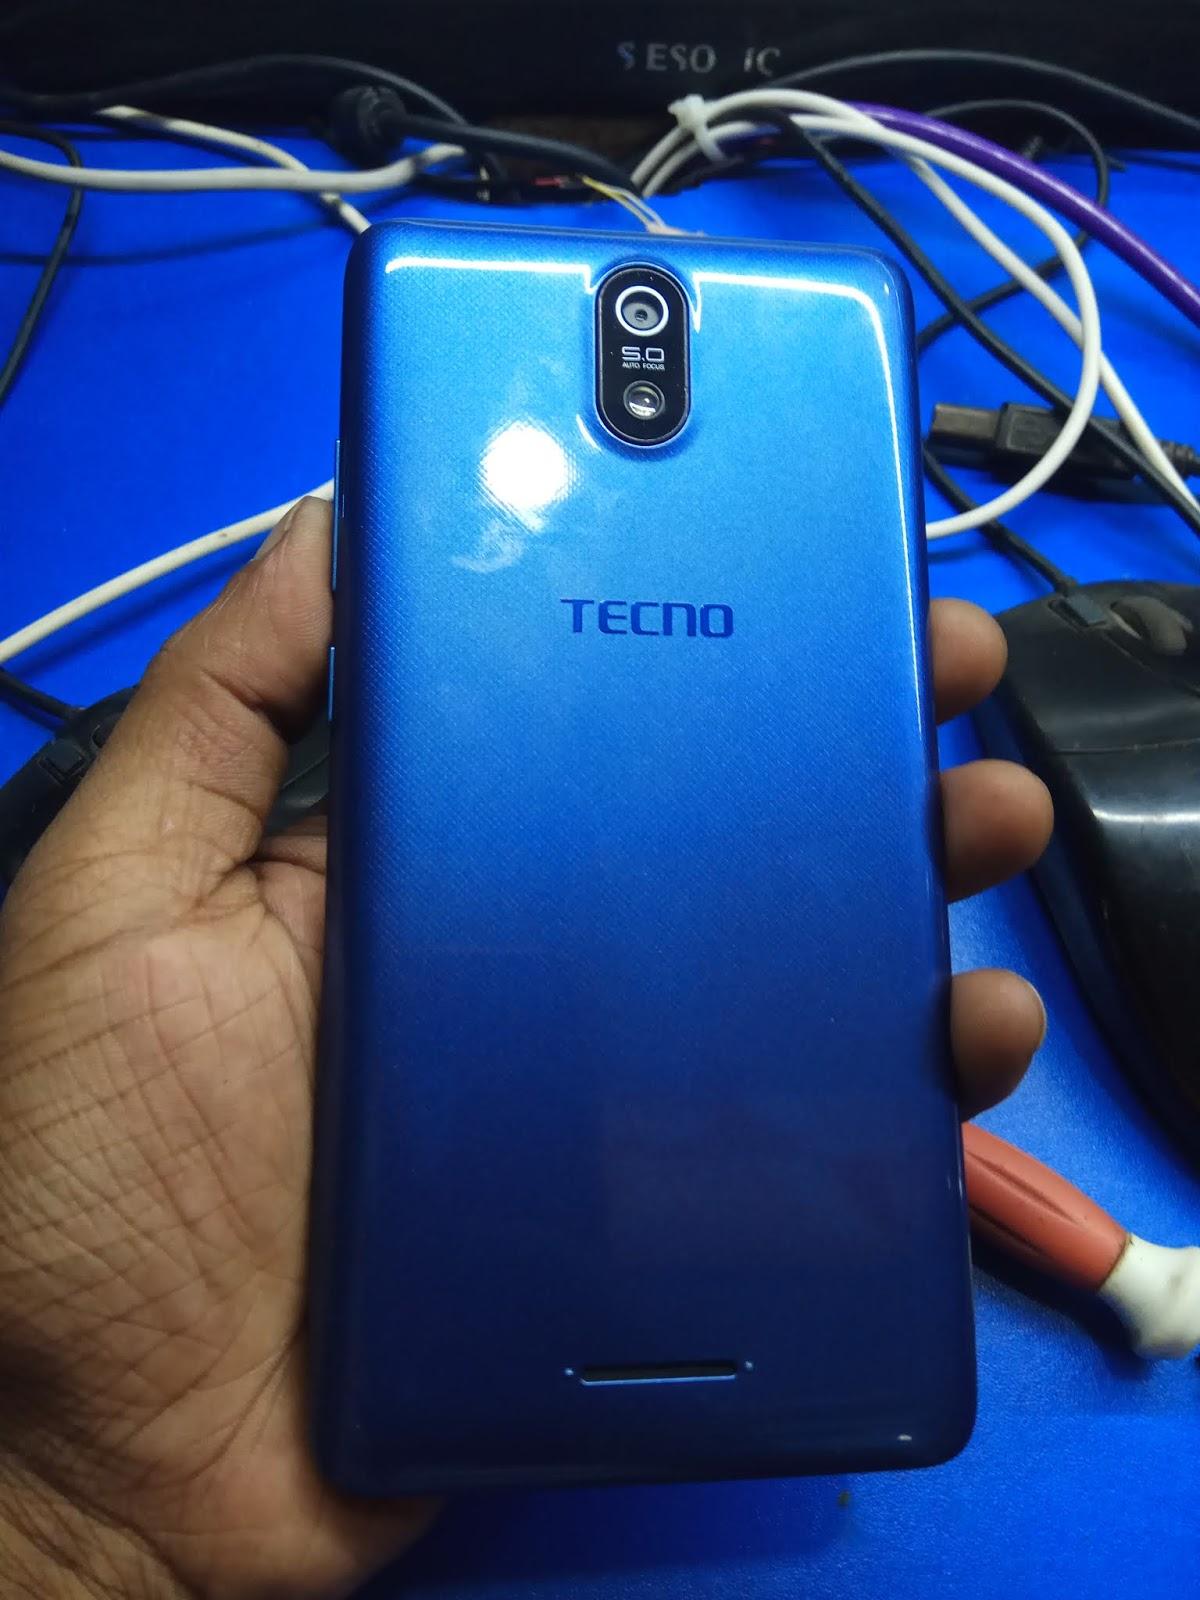 Tecno K9 Firmware